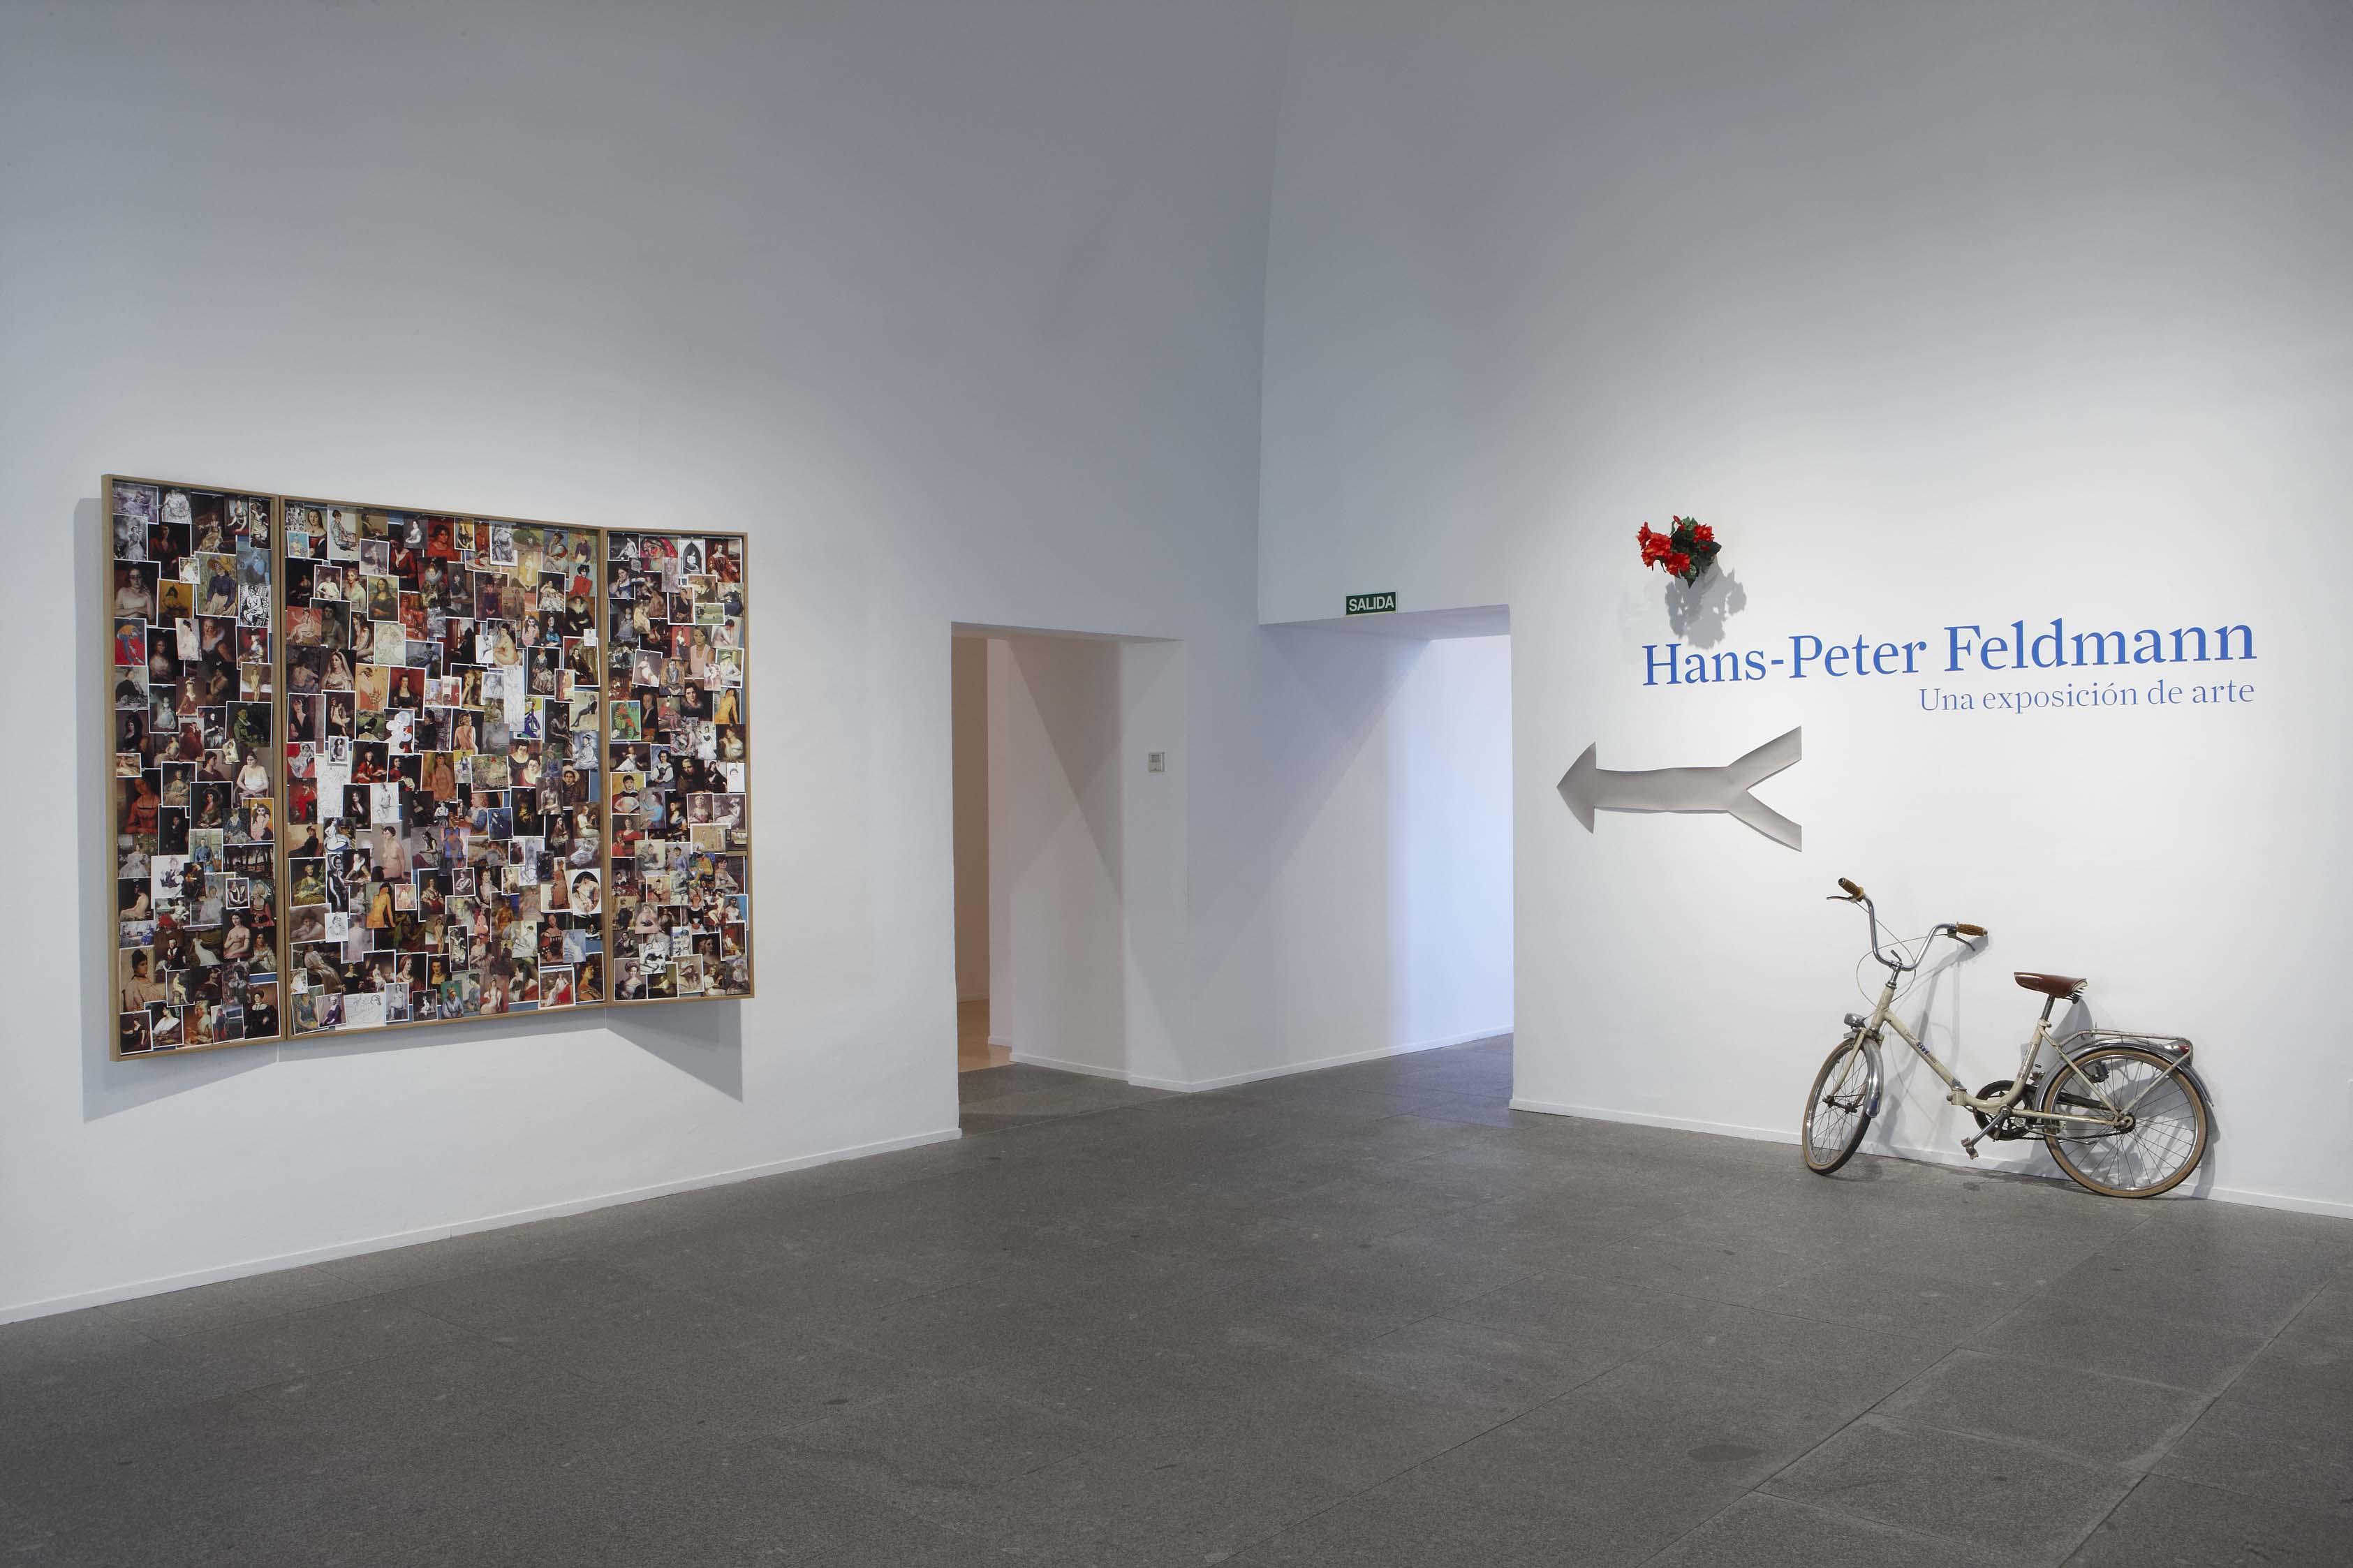 Installation view: Hans-Peter Feldmann. Una exposición de arte, MNCARS, Madrid, 2011 |  | ProjecteSD